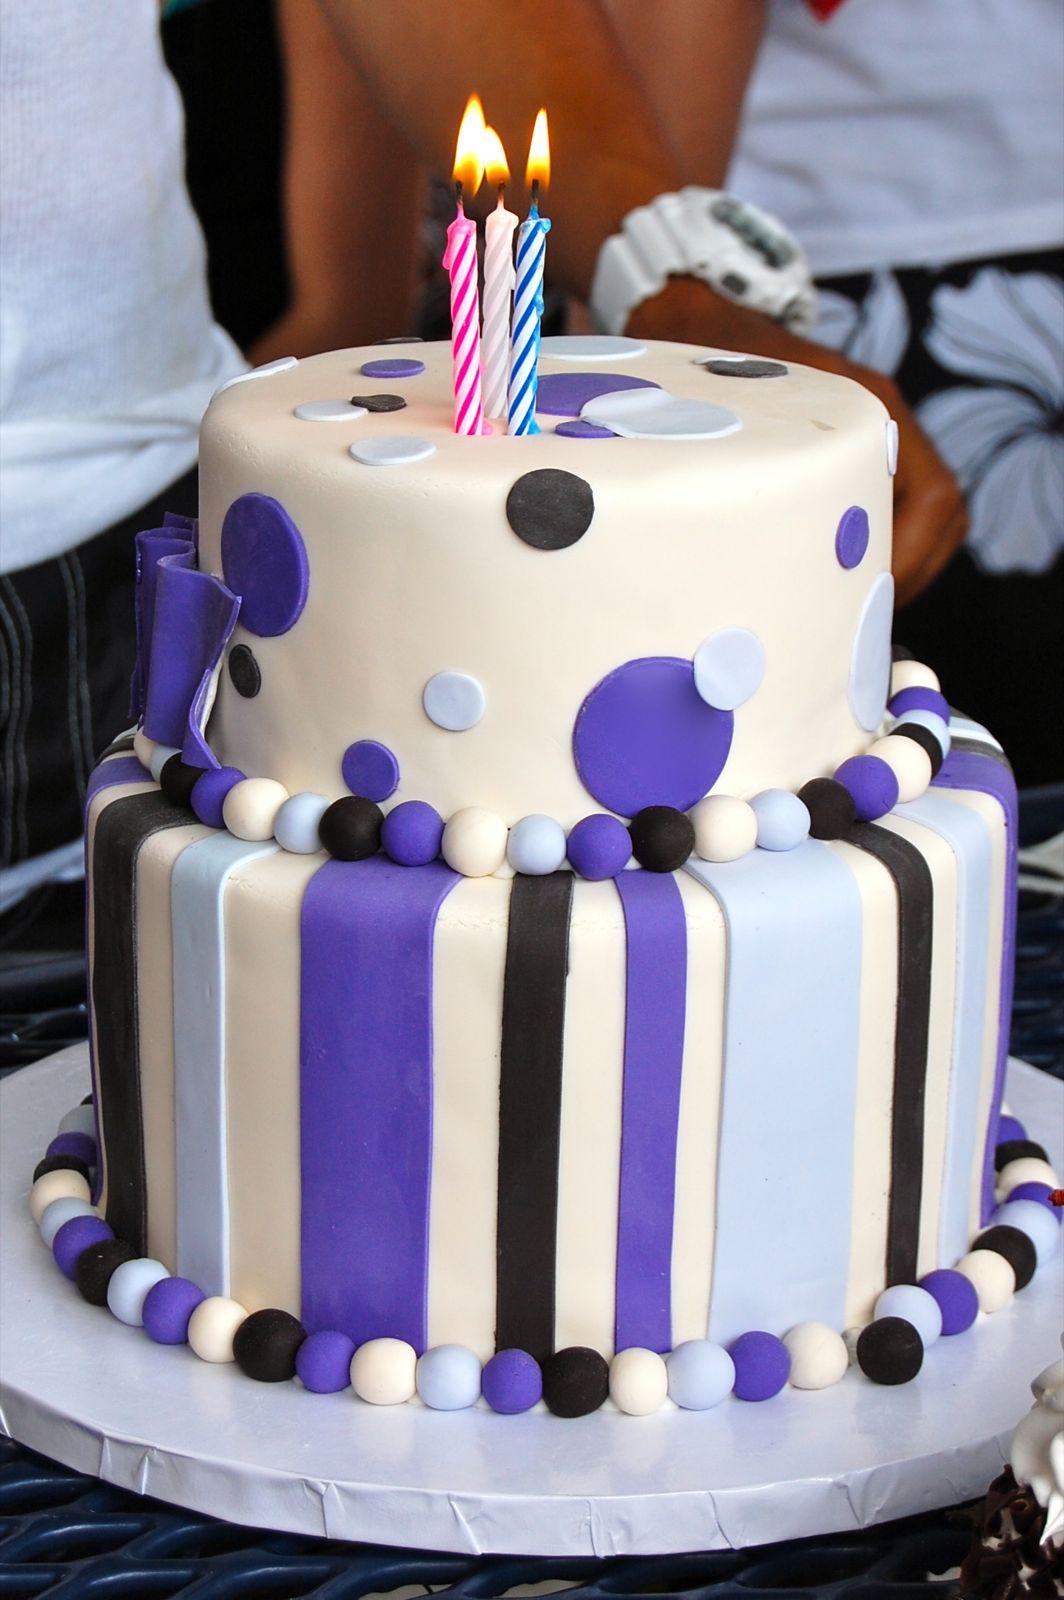 Order A Vons Birthday Cake